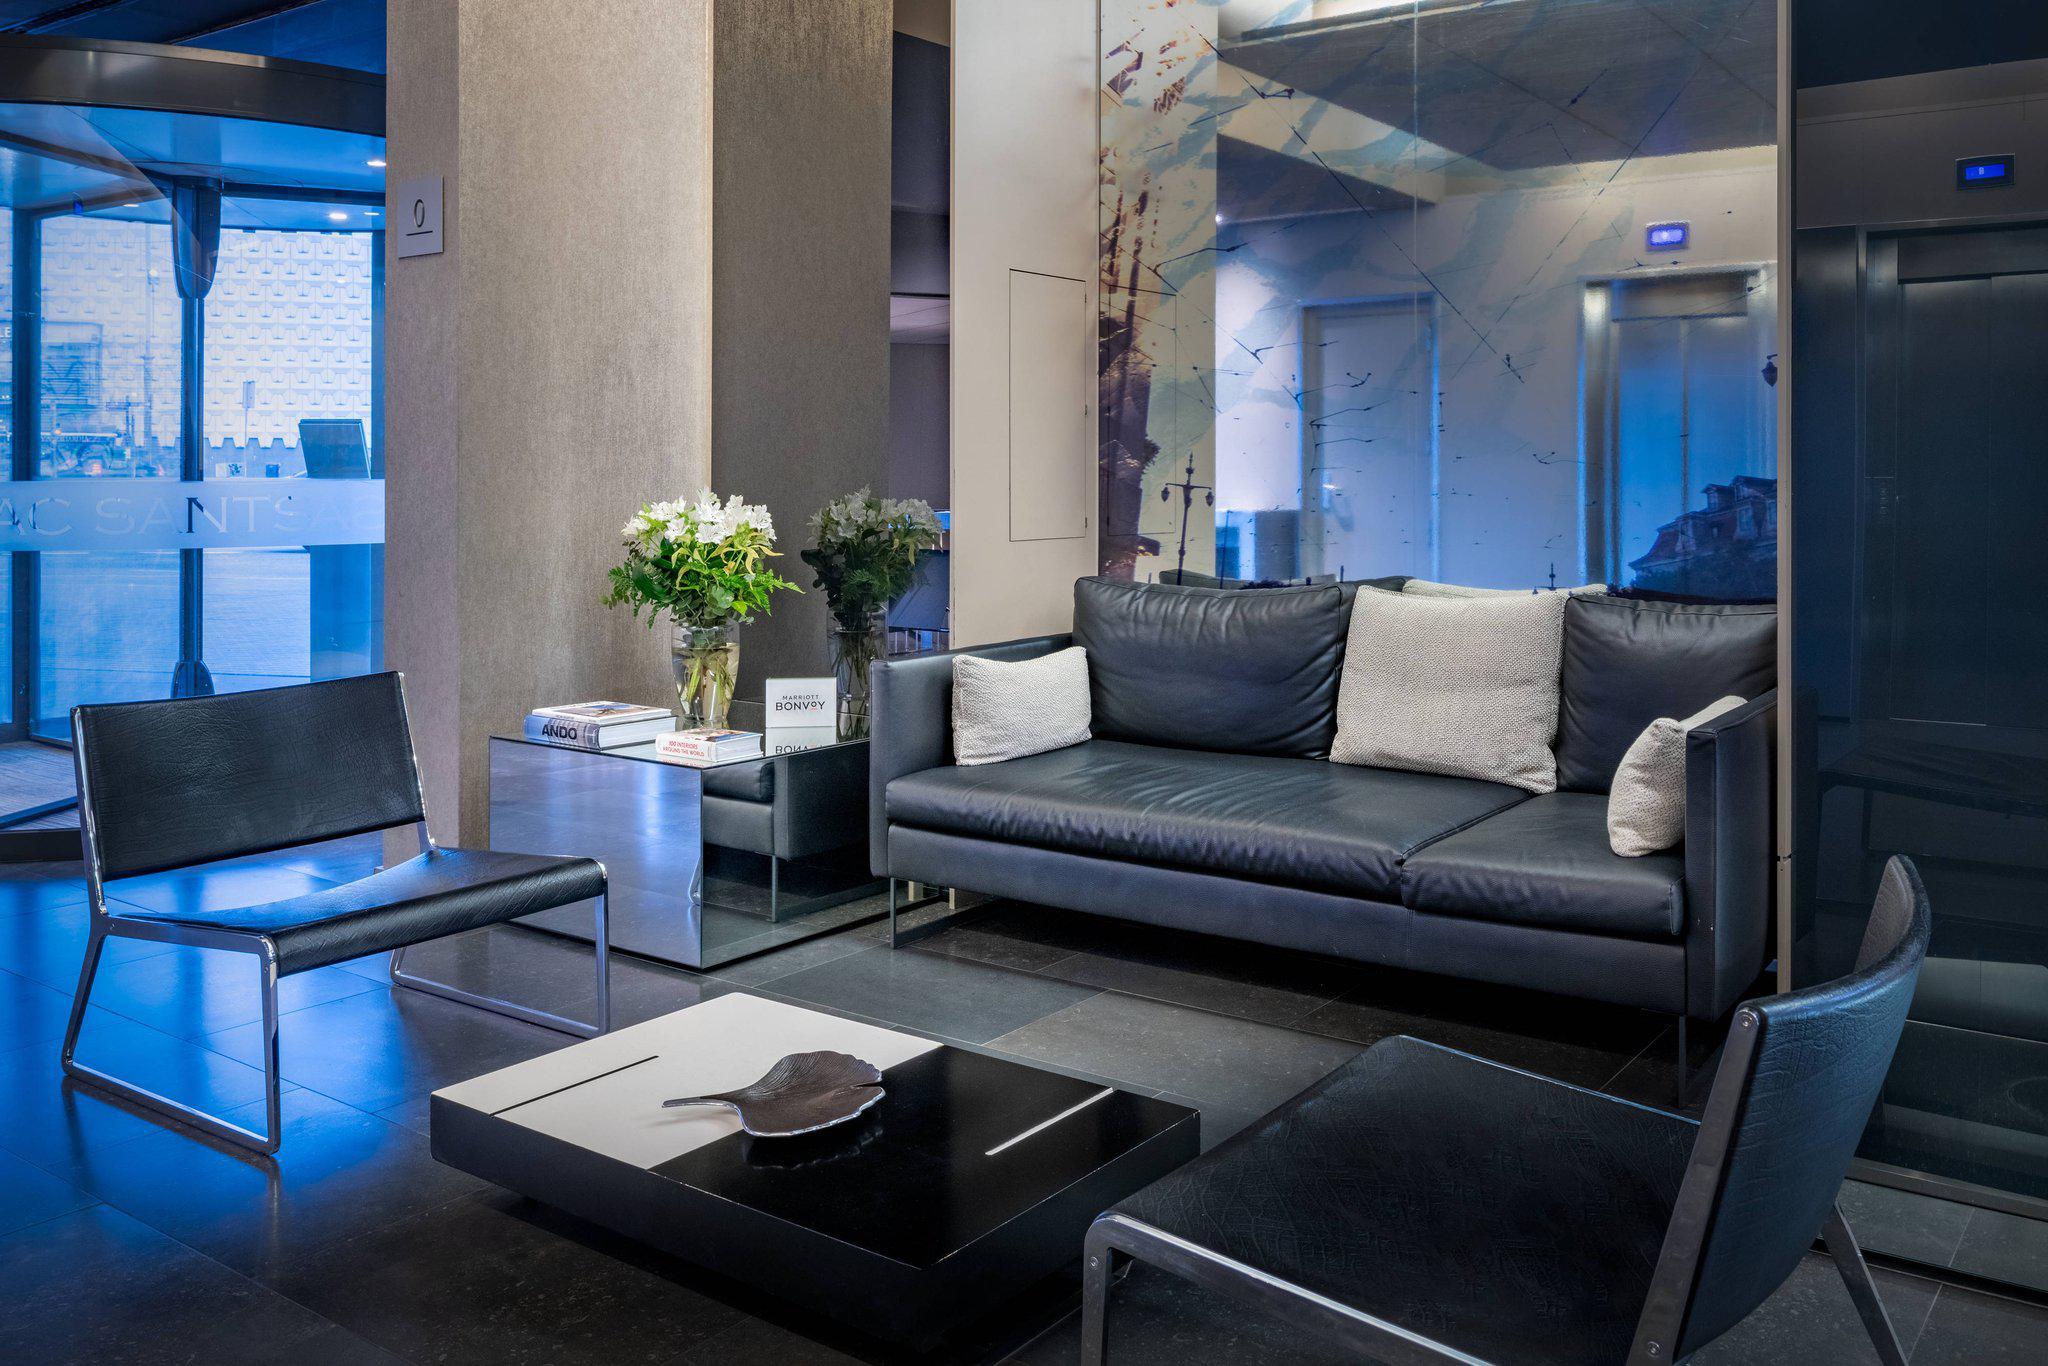 AC Hotel by Marriott Sants